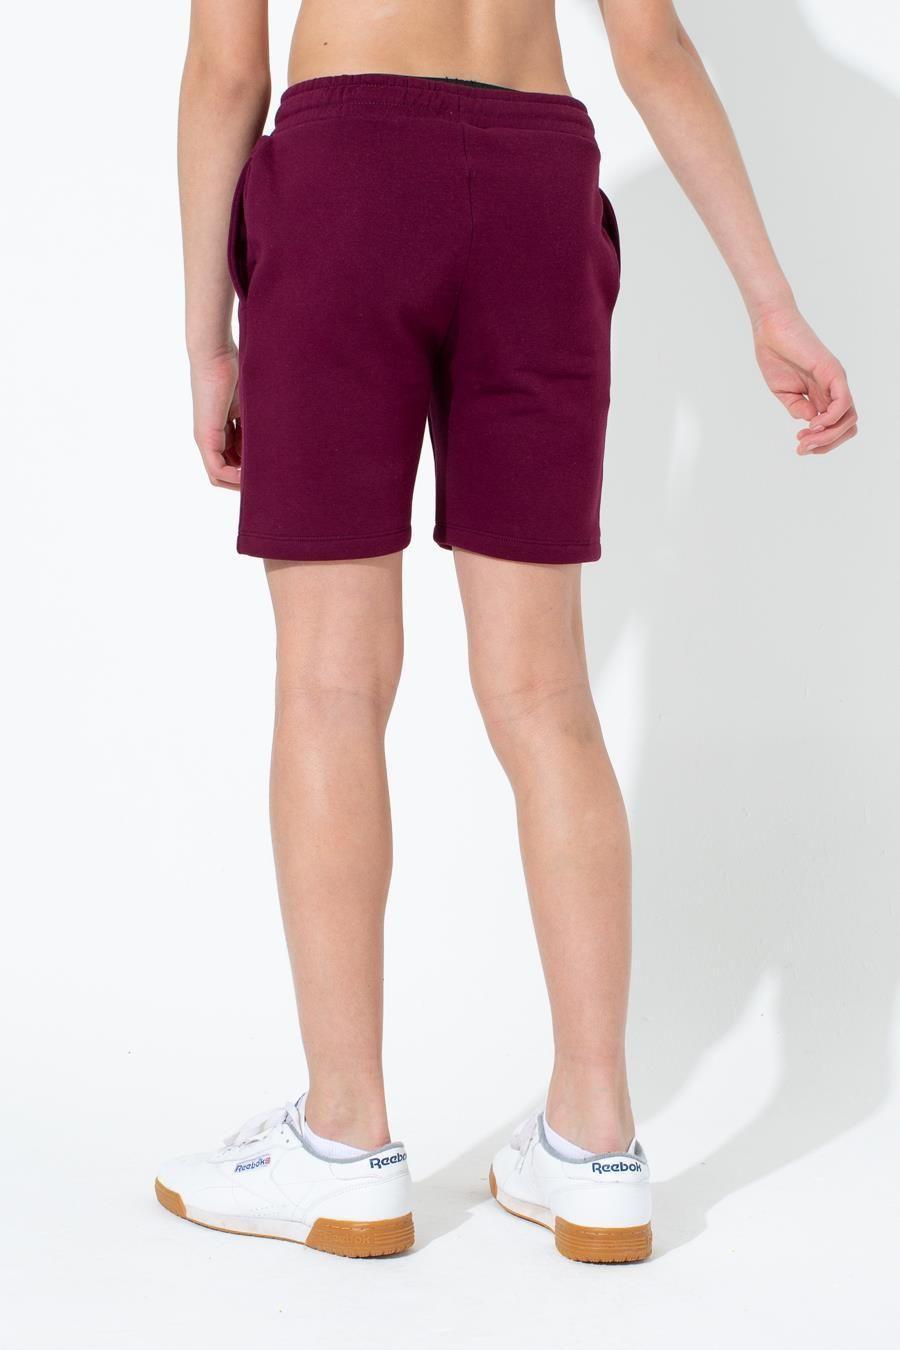 Hype Burgundy Crest Kids Shorts